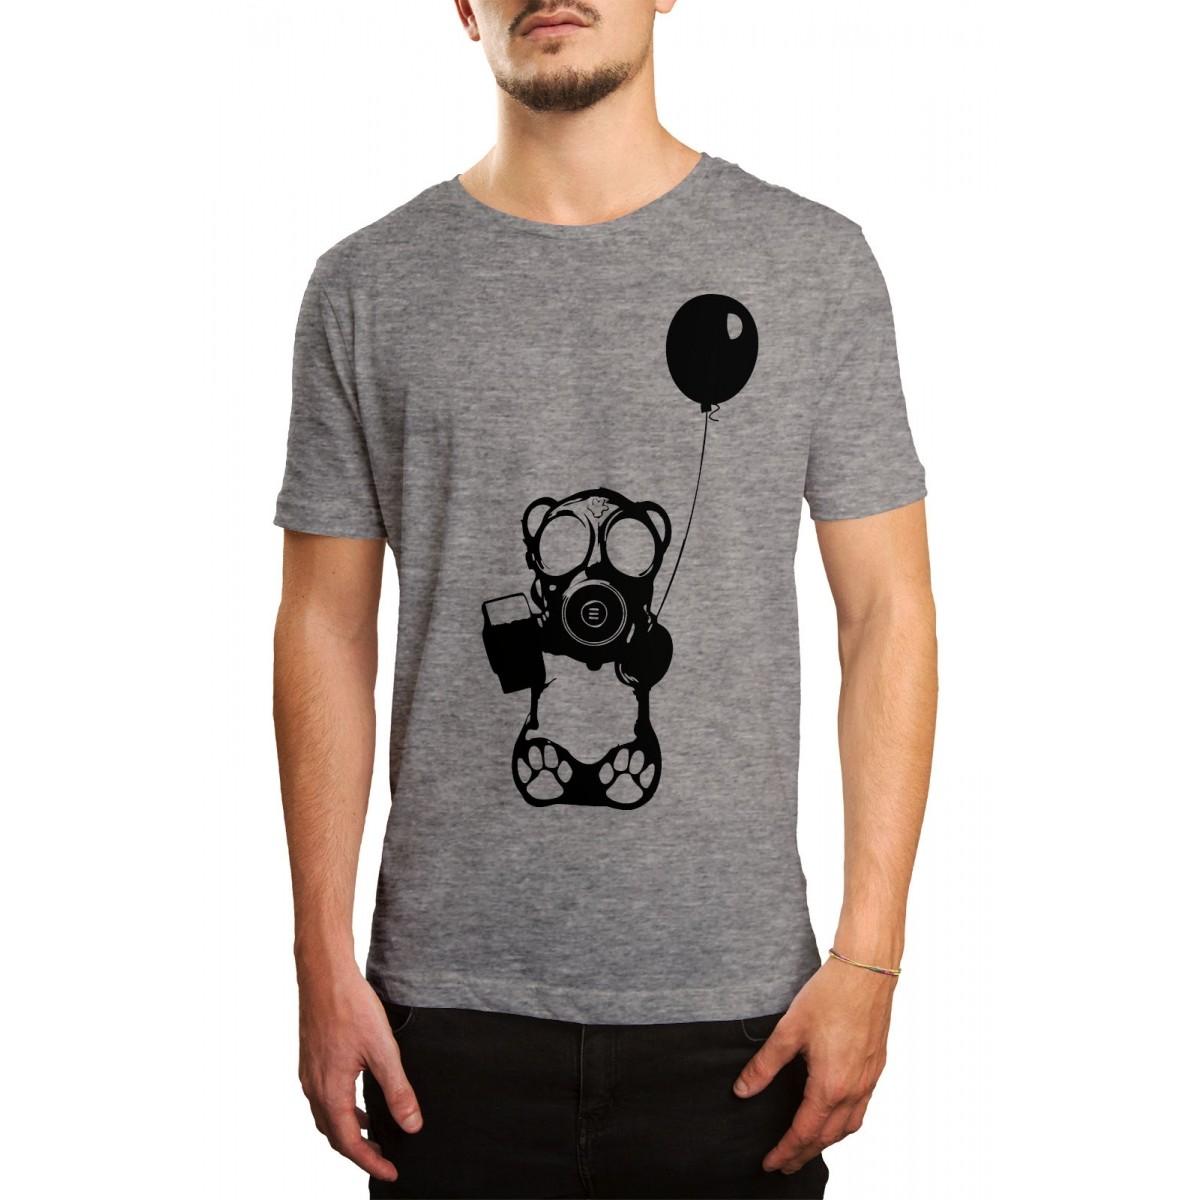 Camiseta HShop Bear Balloon Cinza  - HShop